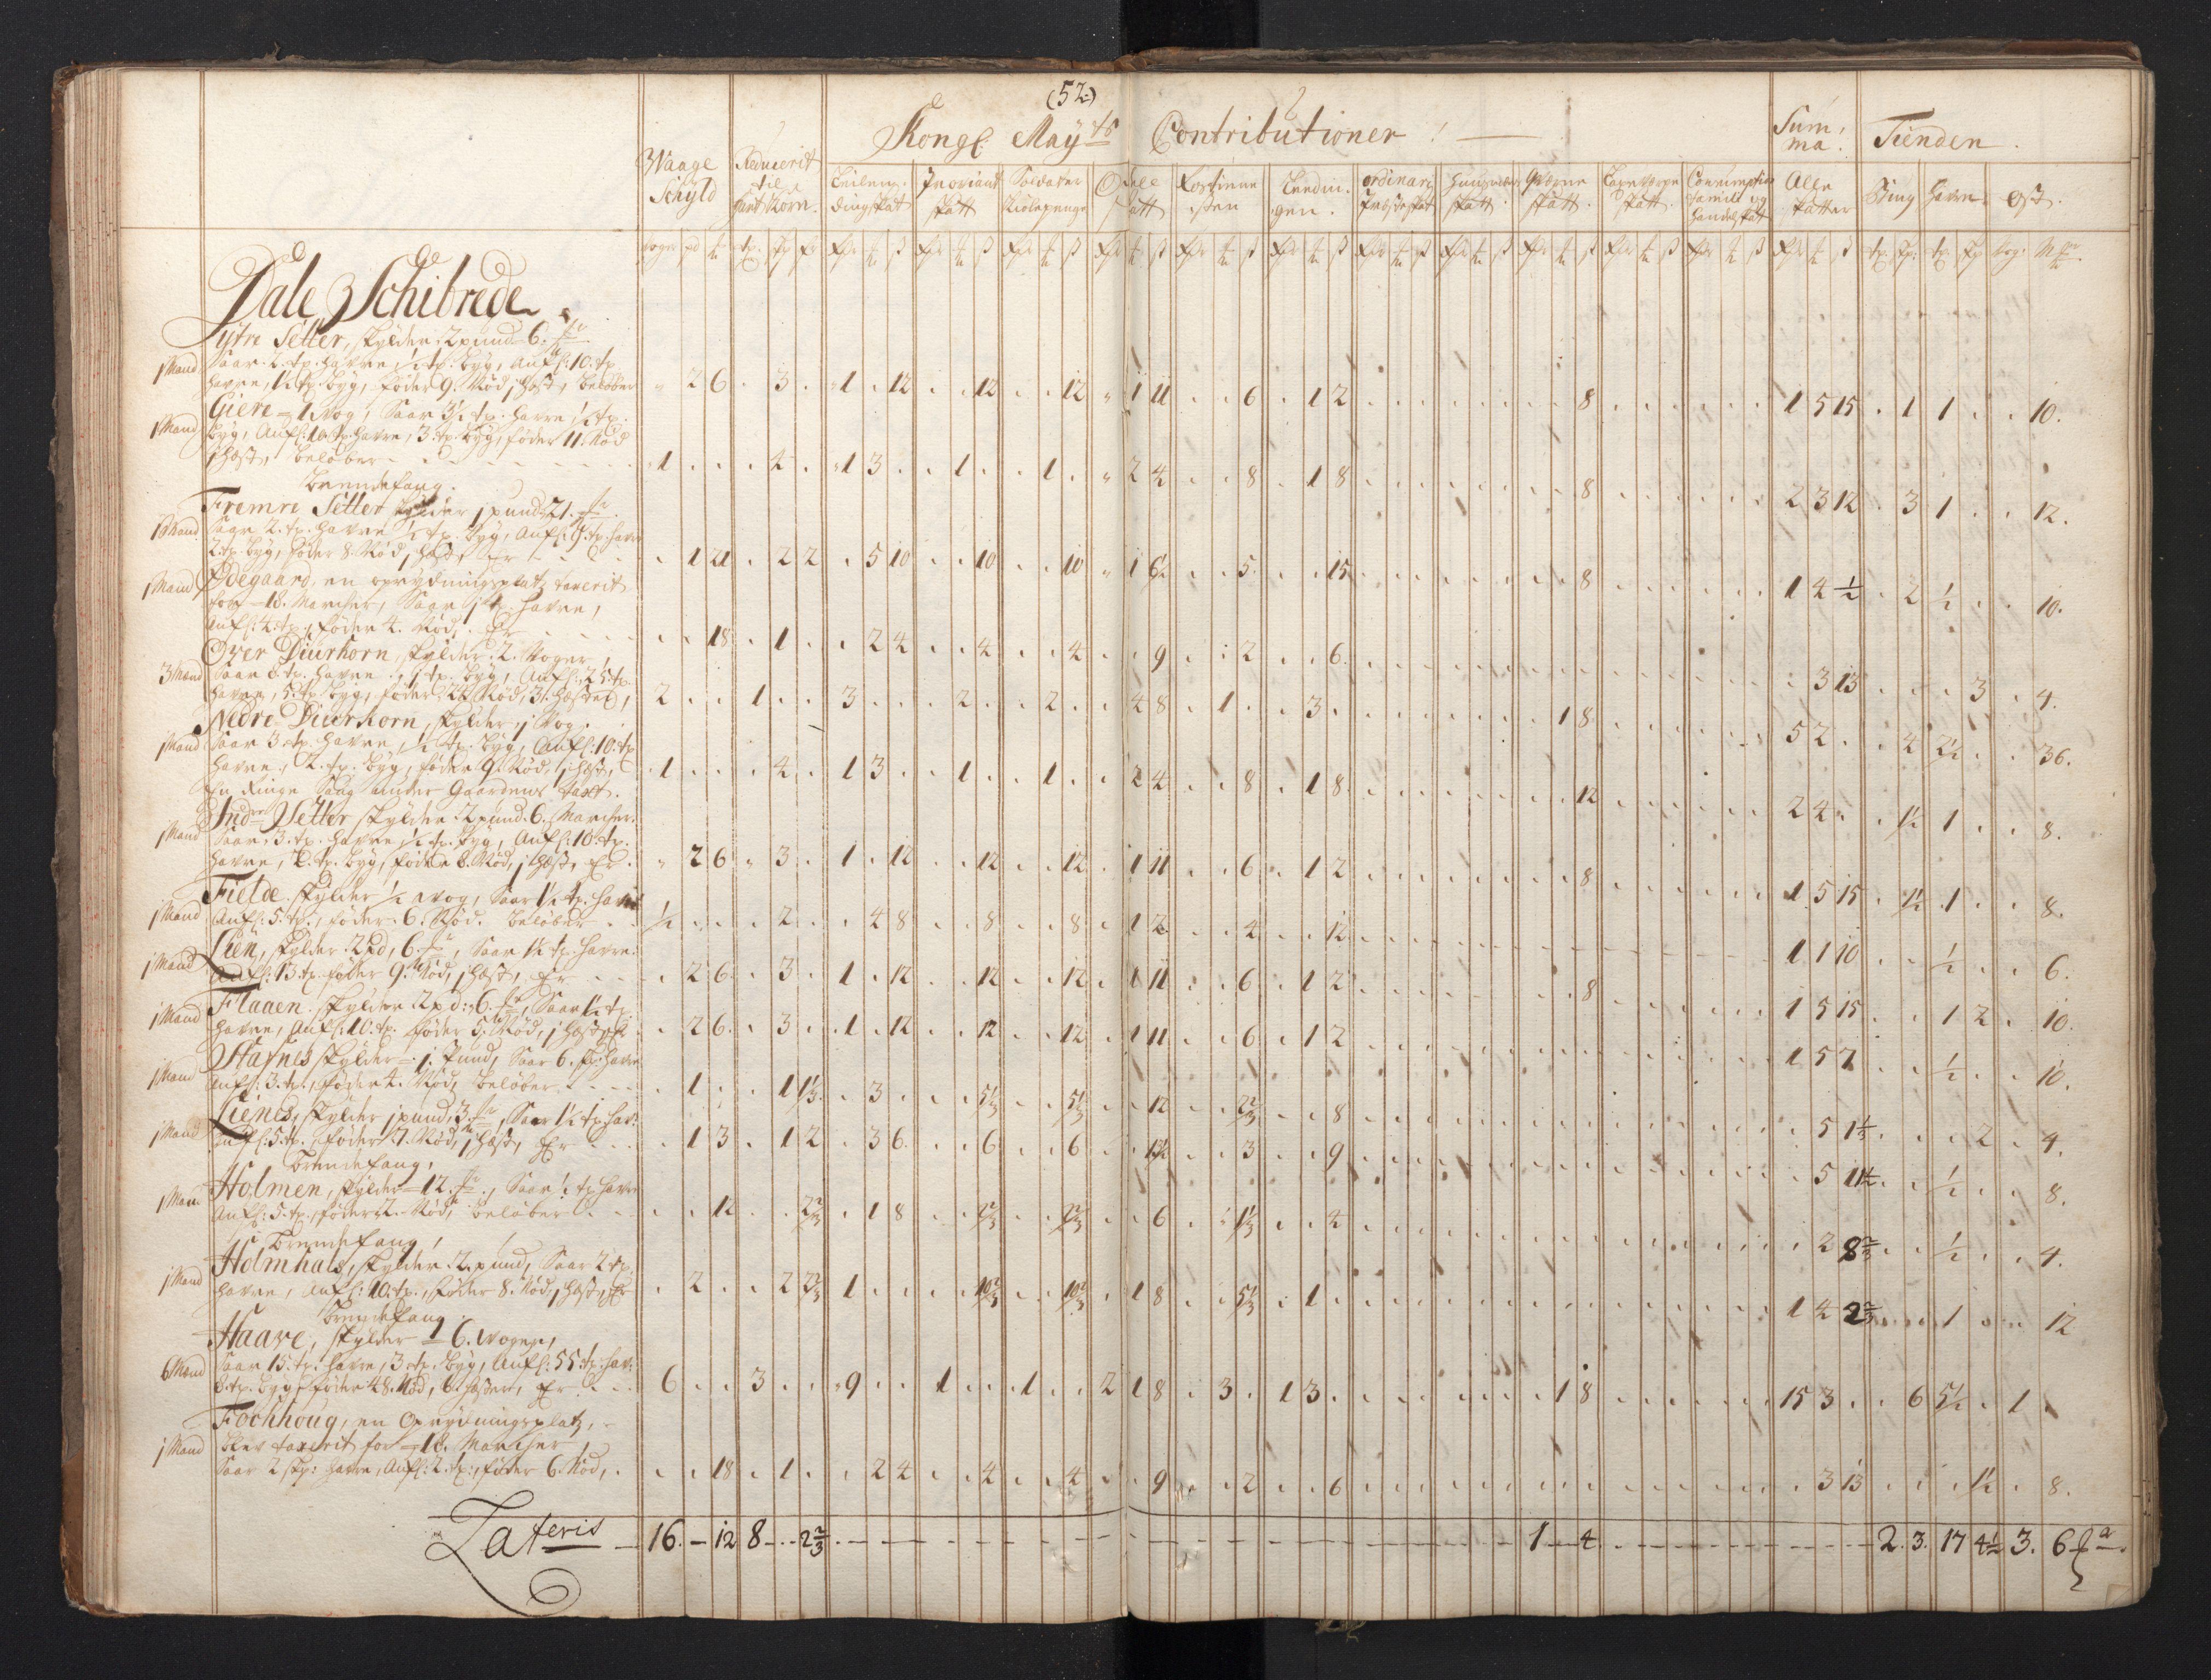 RA, Rentekammeret inntil 1814, Realistisk ordnet avdeling, N/Nb/Nbf/L0149: Sunnmøre, prøvematrikkel, 1714, s. 51b-52a